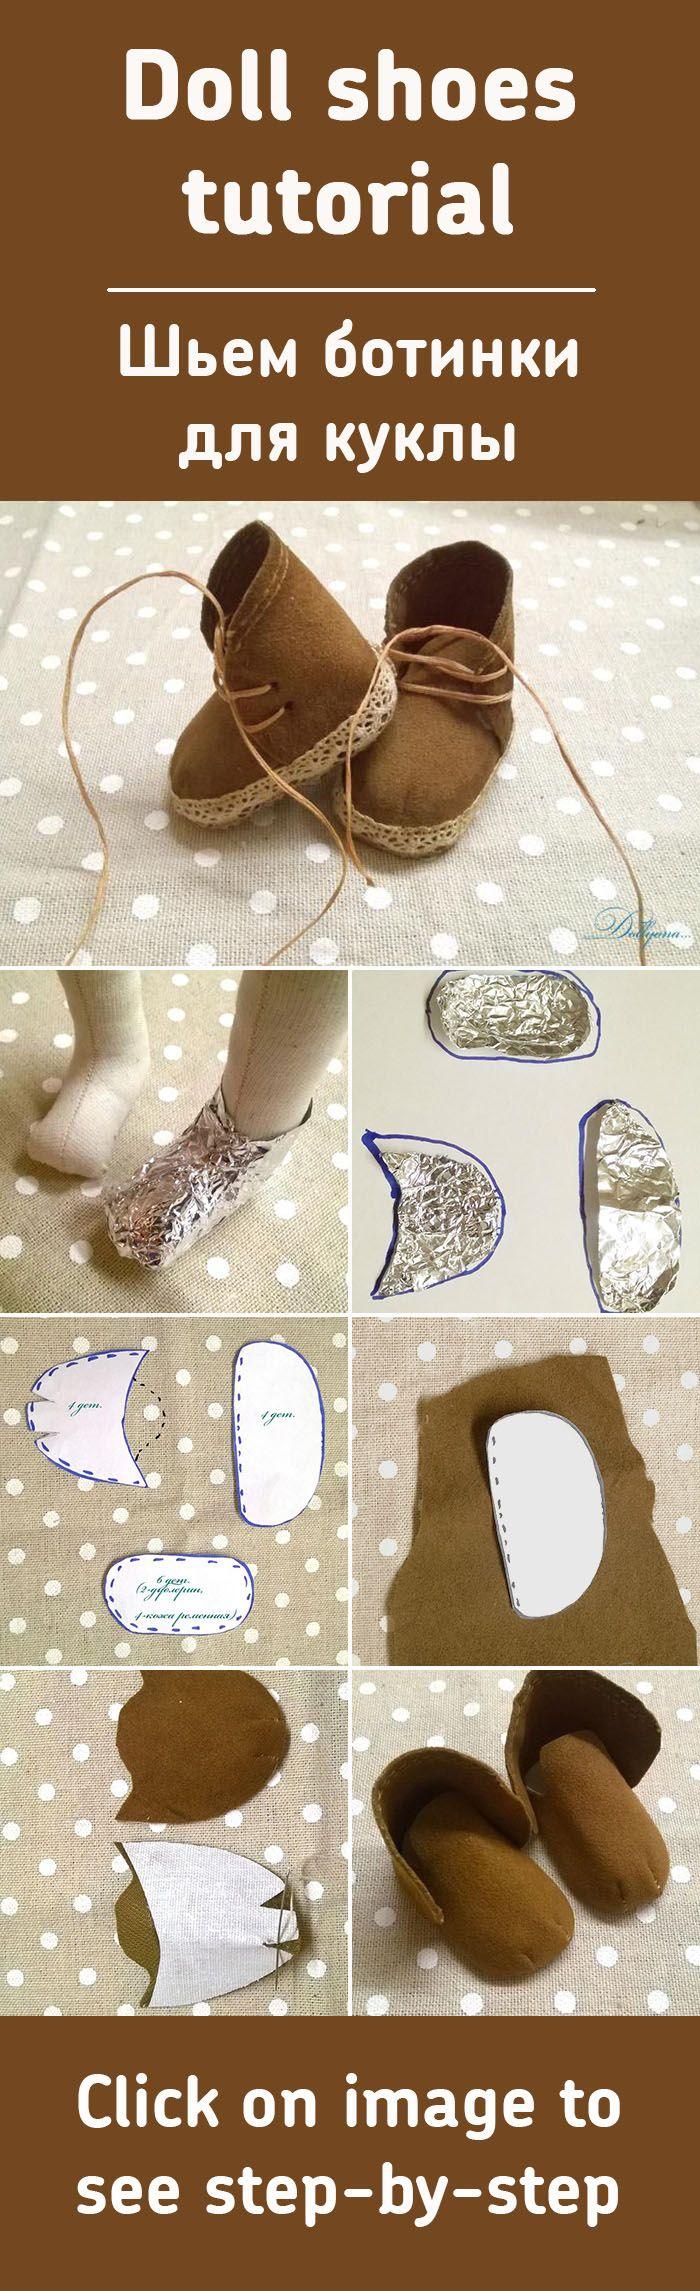 Шьем ботиночки для куклы / Doll shoes tutorial